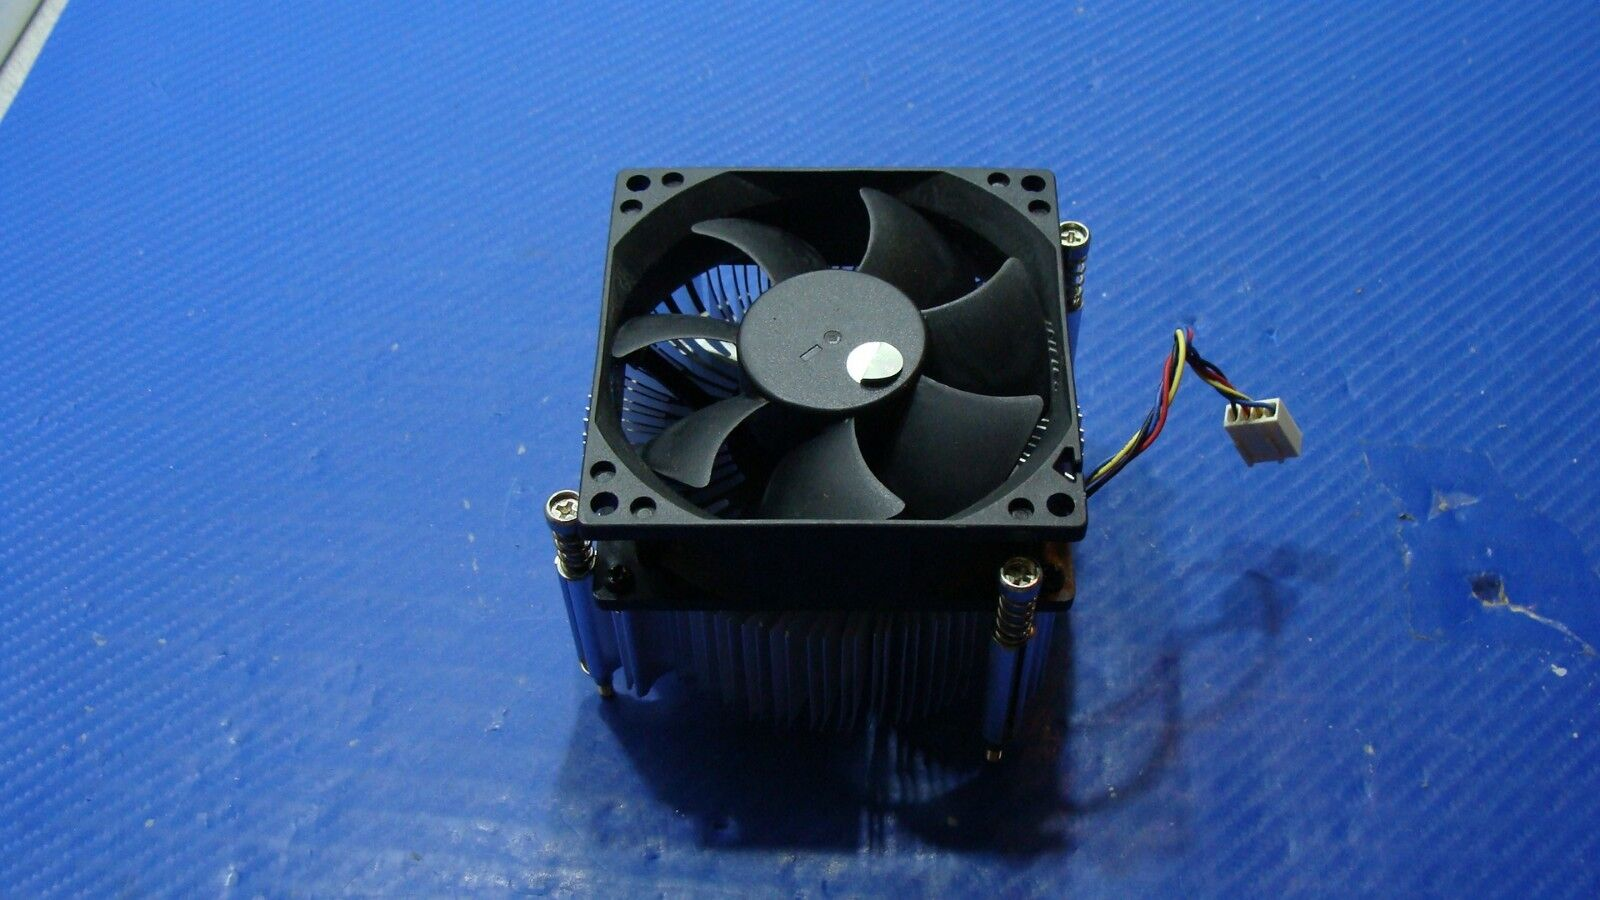 WQFStore All-in-one Laptop Radiator Cooling Fan CPU Cooling Fan